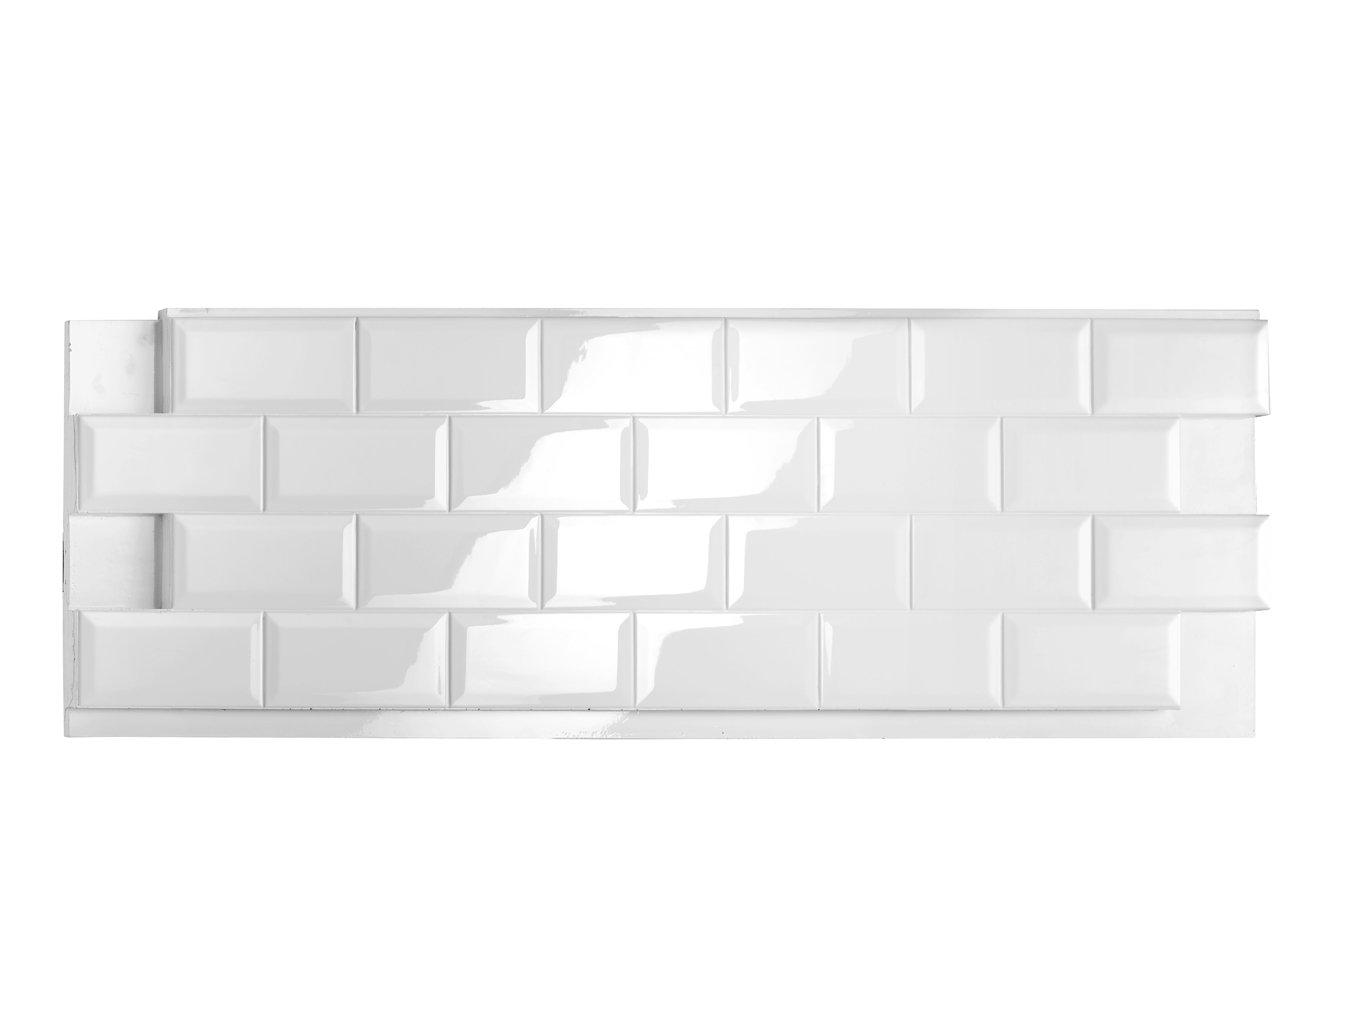 PX 149 9016 Metro Tile Alto Brillo